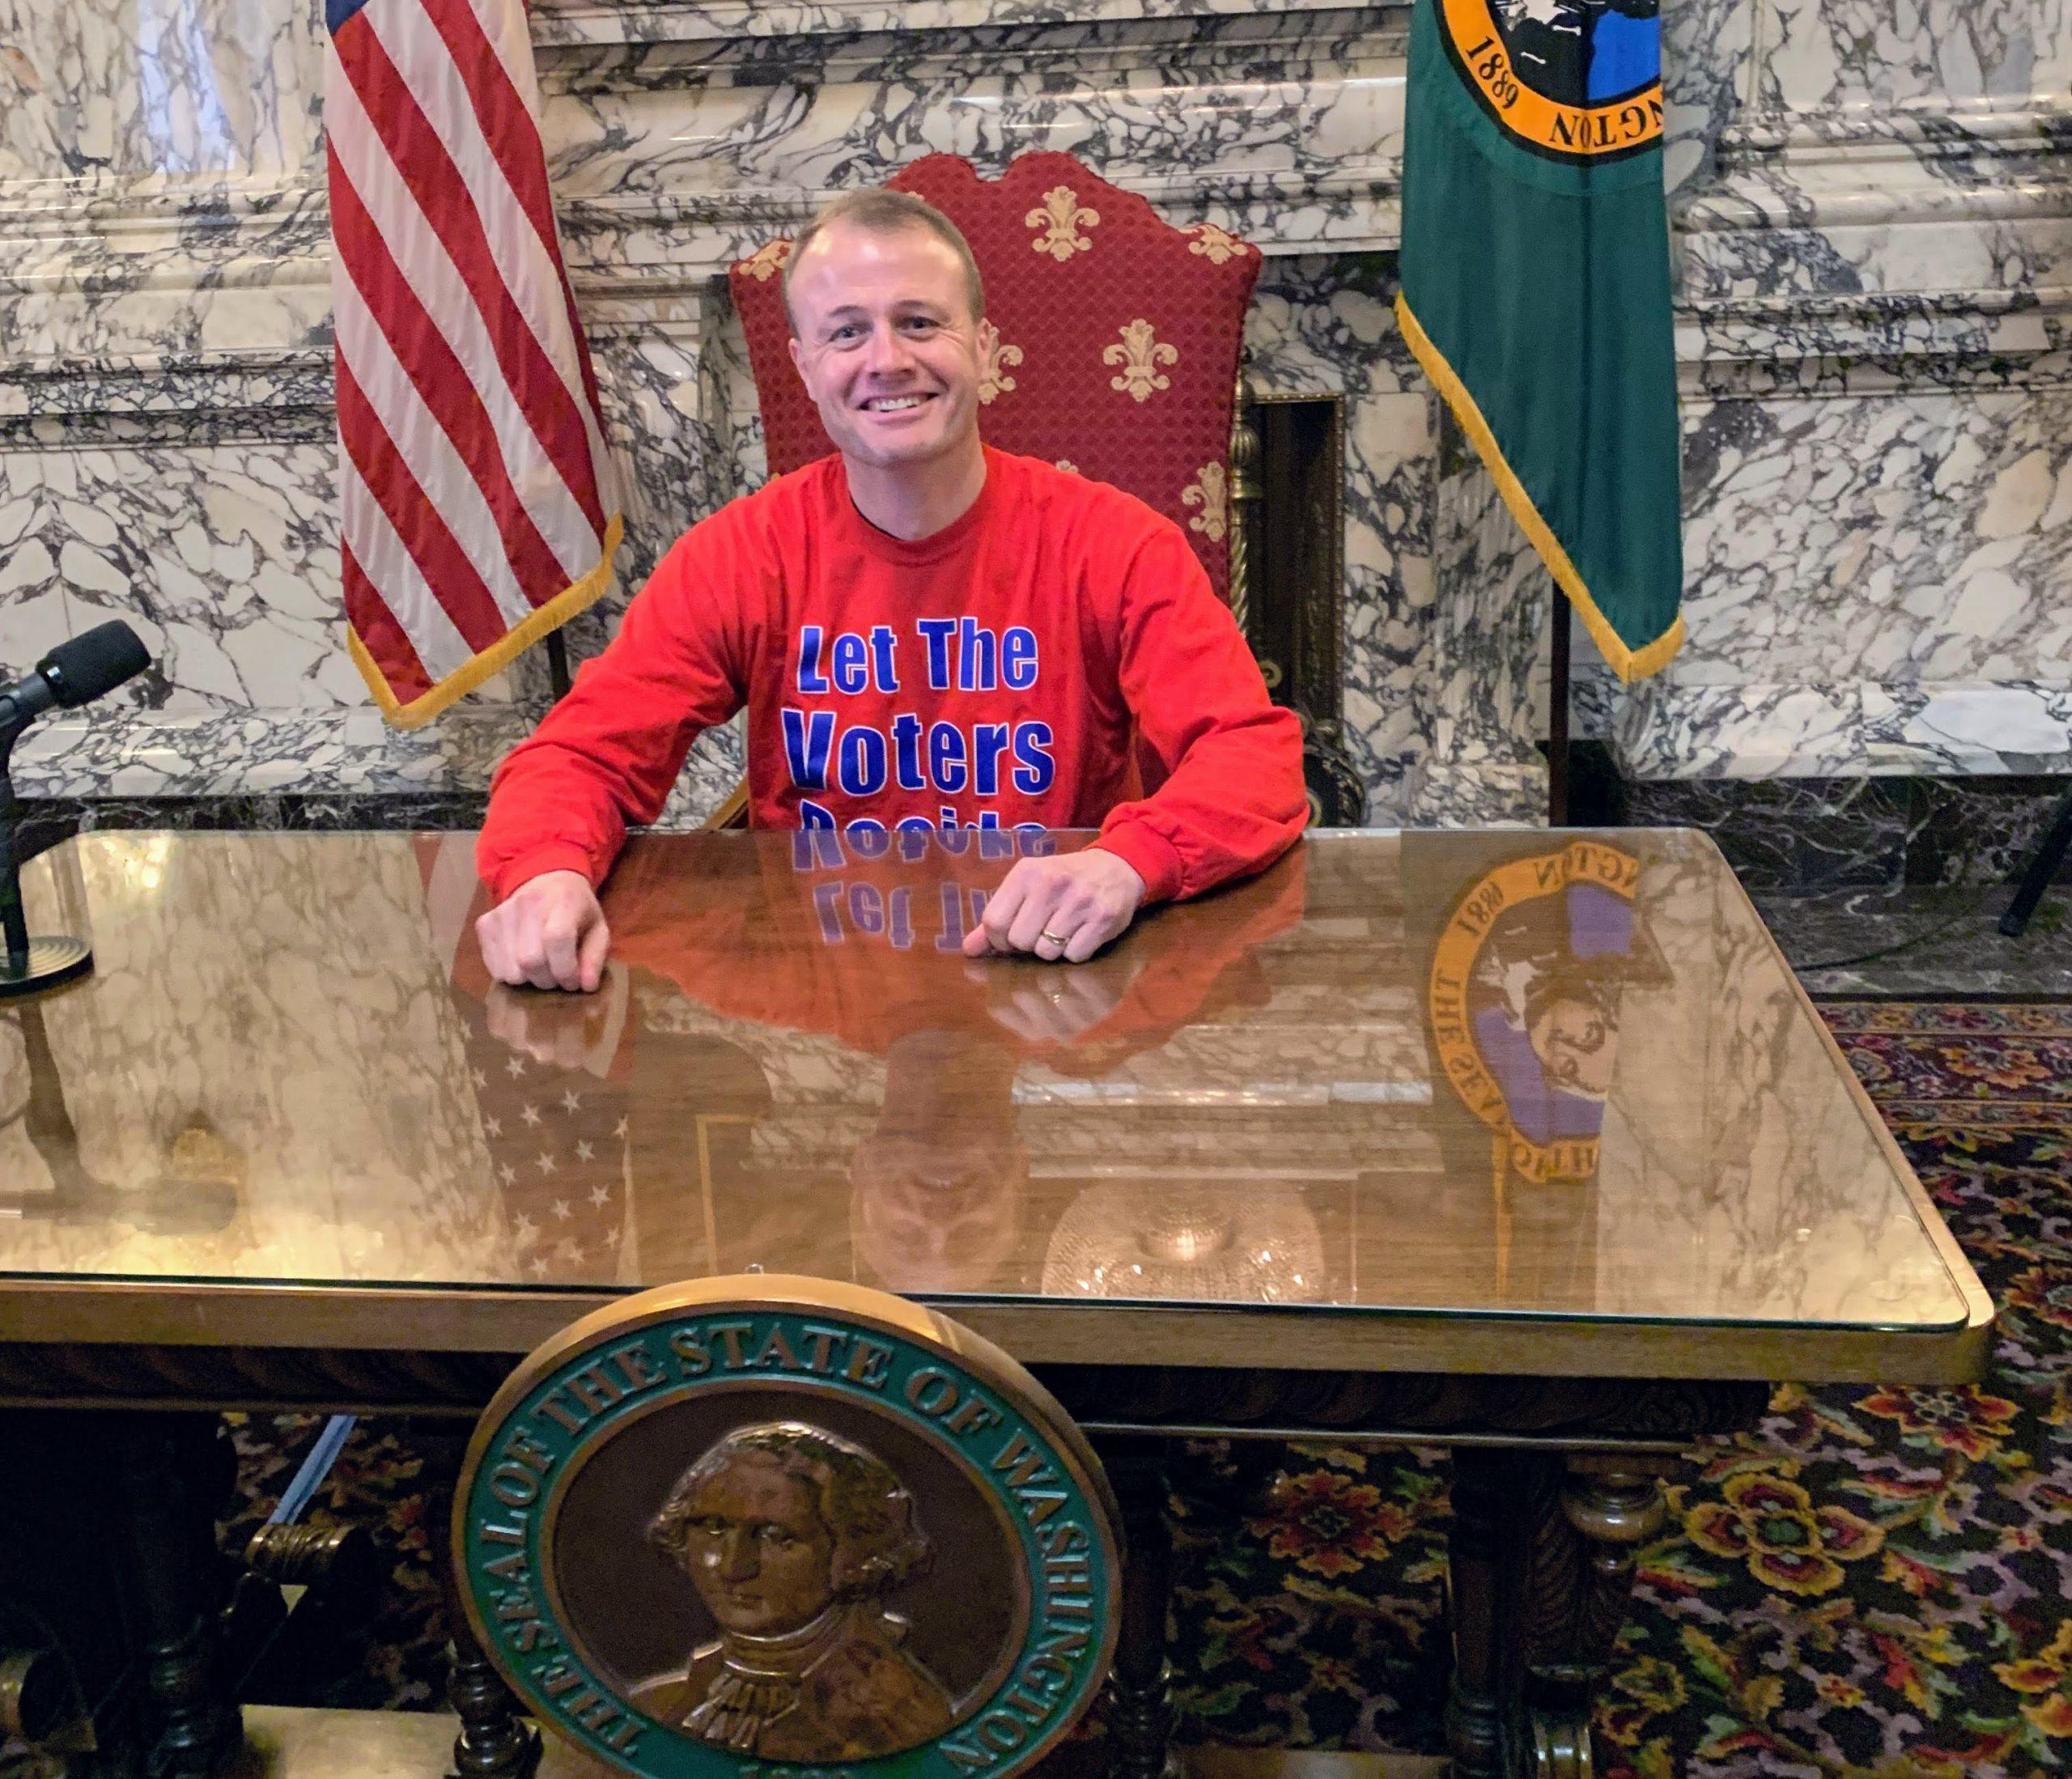 Tim Eyman pretends to be governor